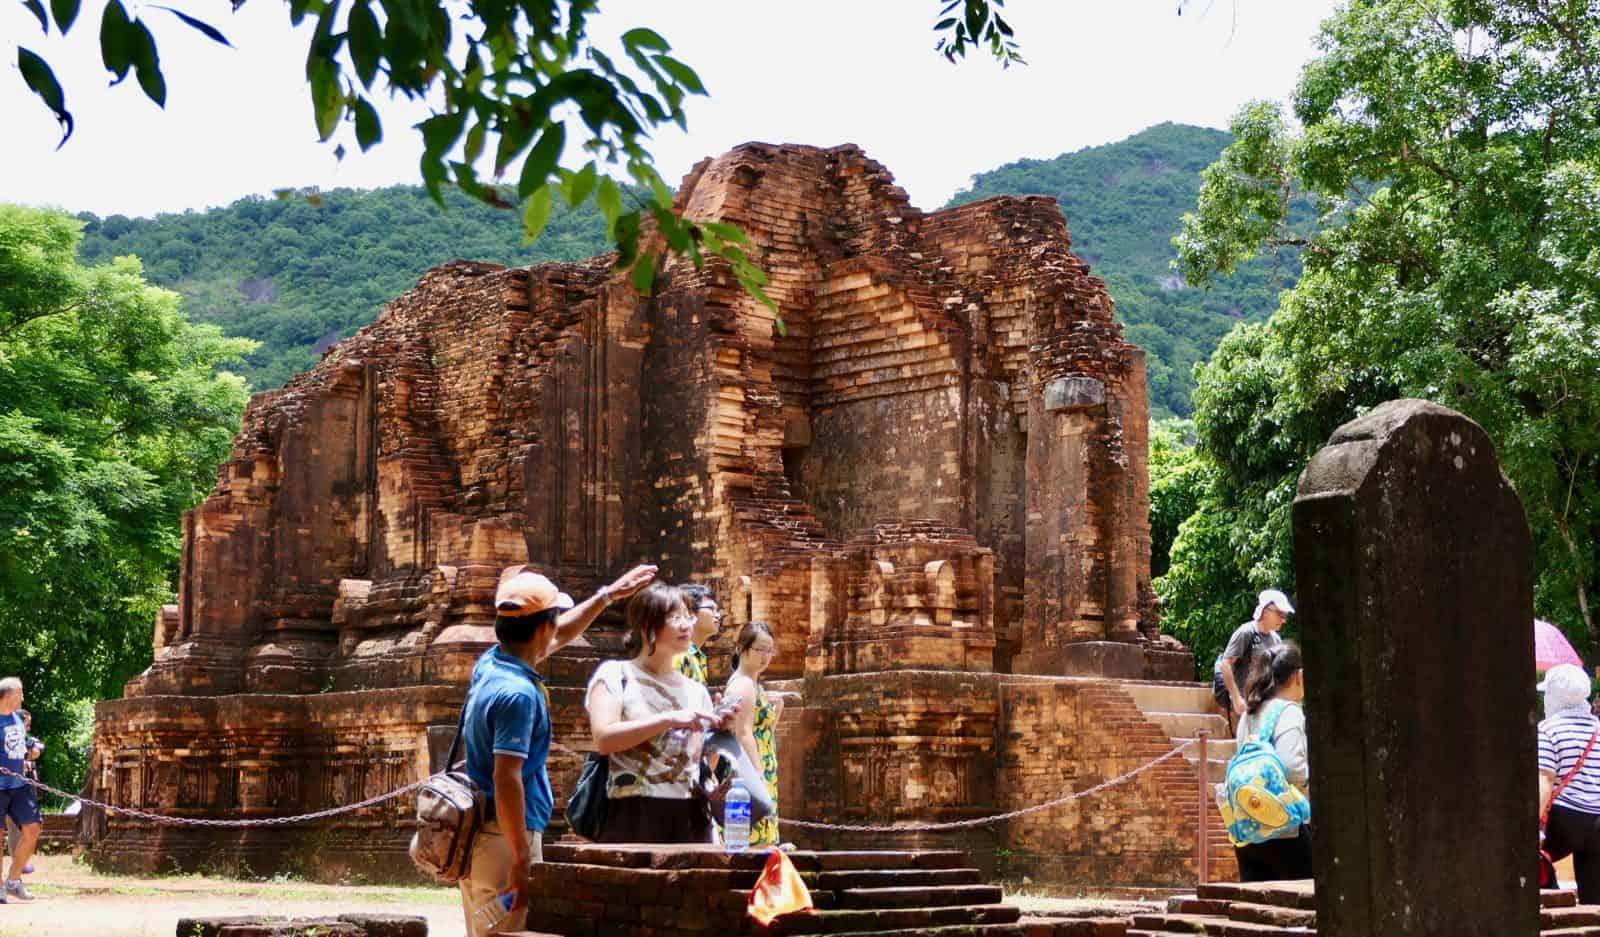 More My Son tourists Vietnam Hoi An betternotstop Temple ruins